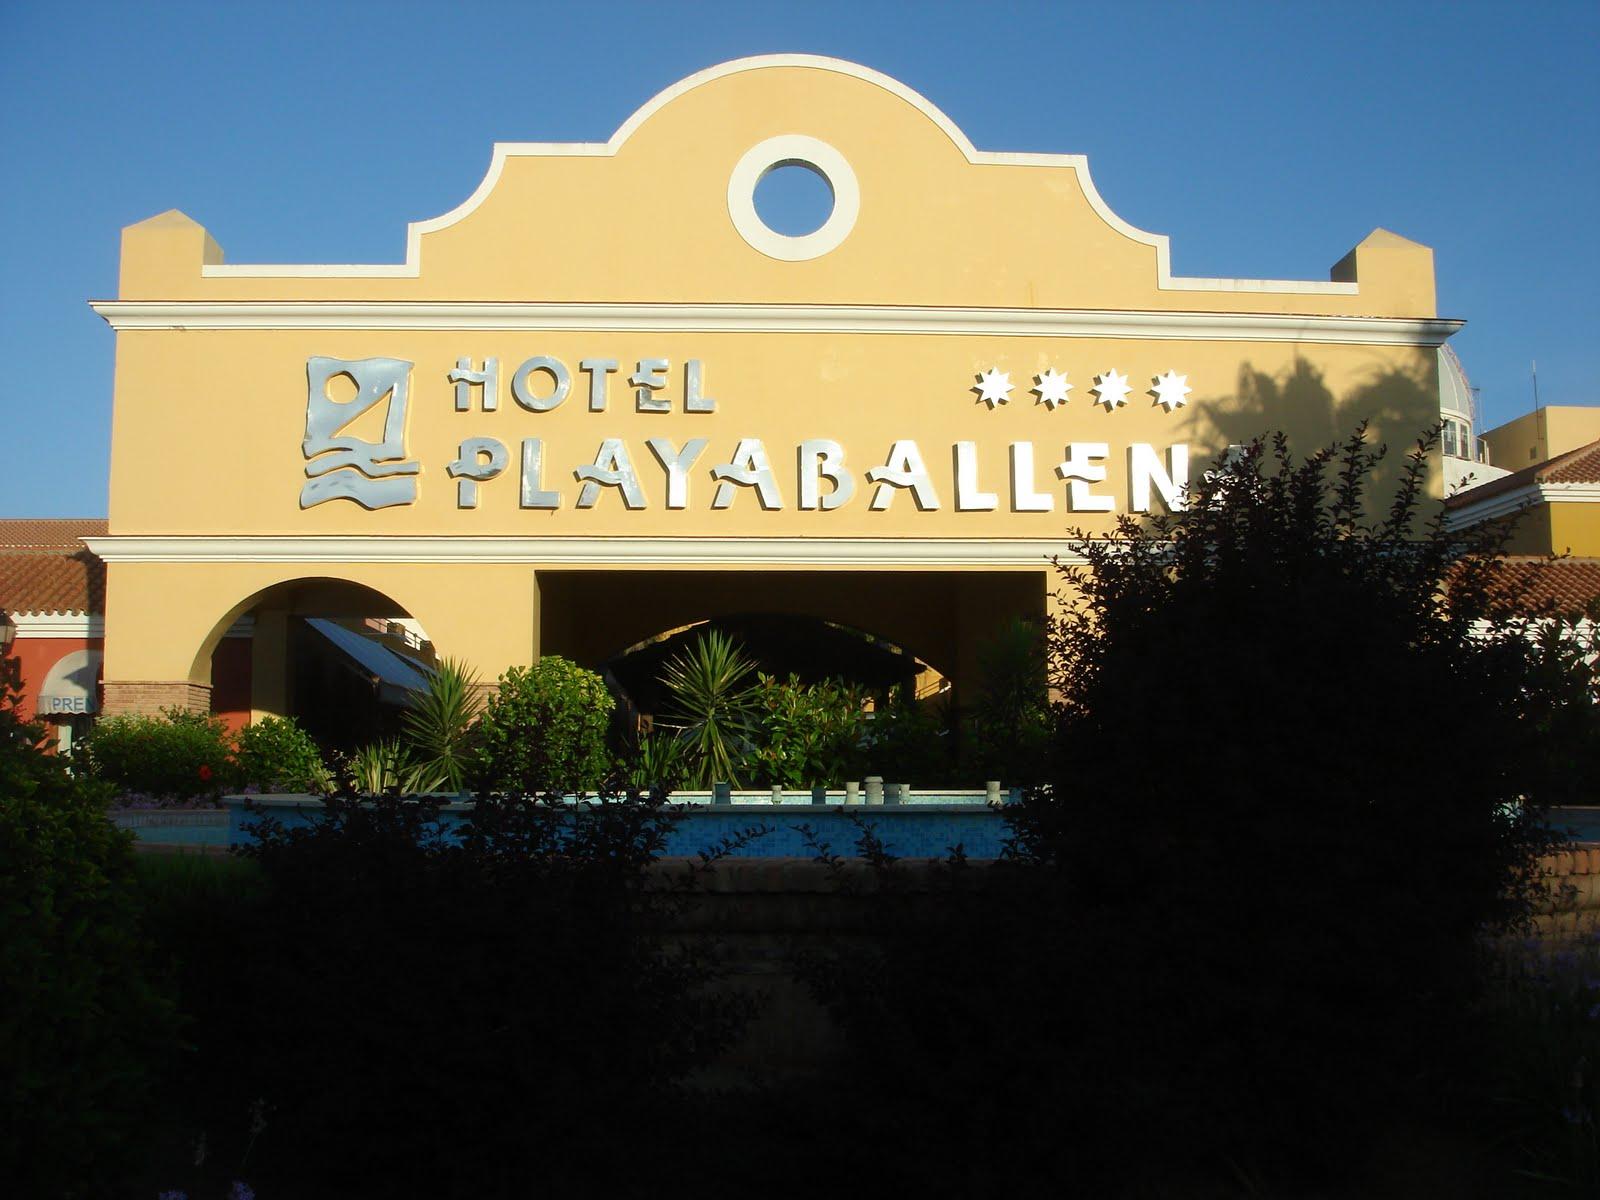 hotel ballena cadiz: